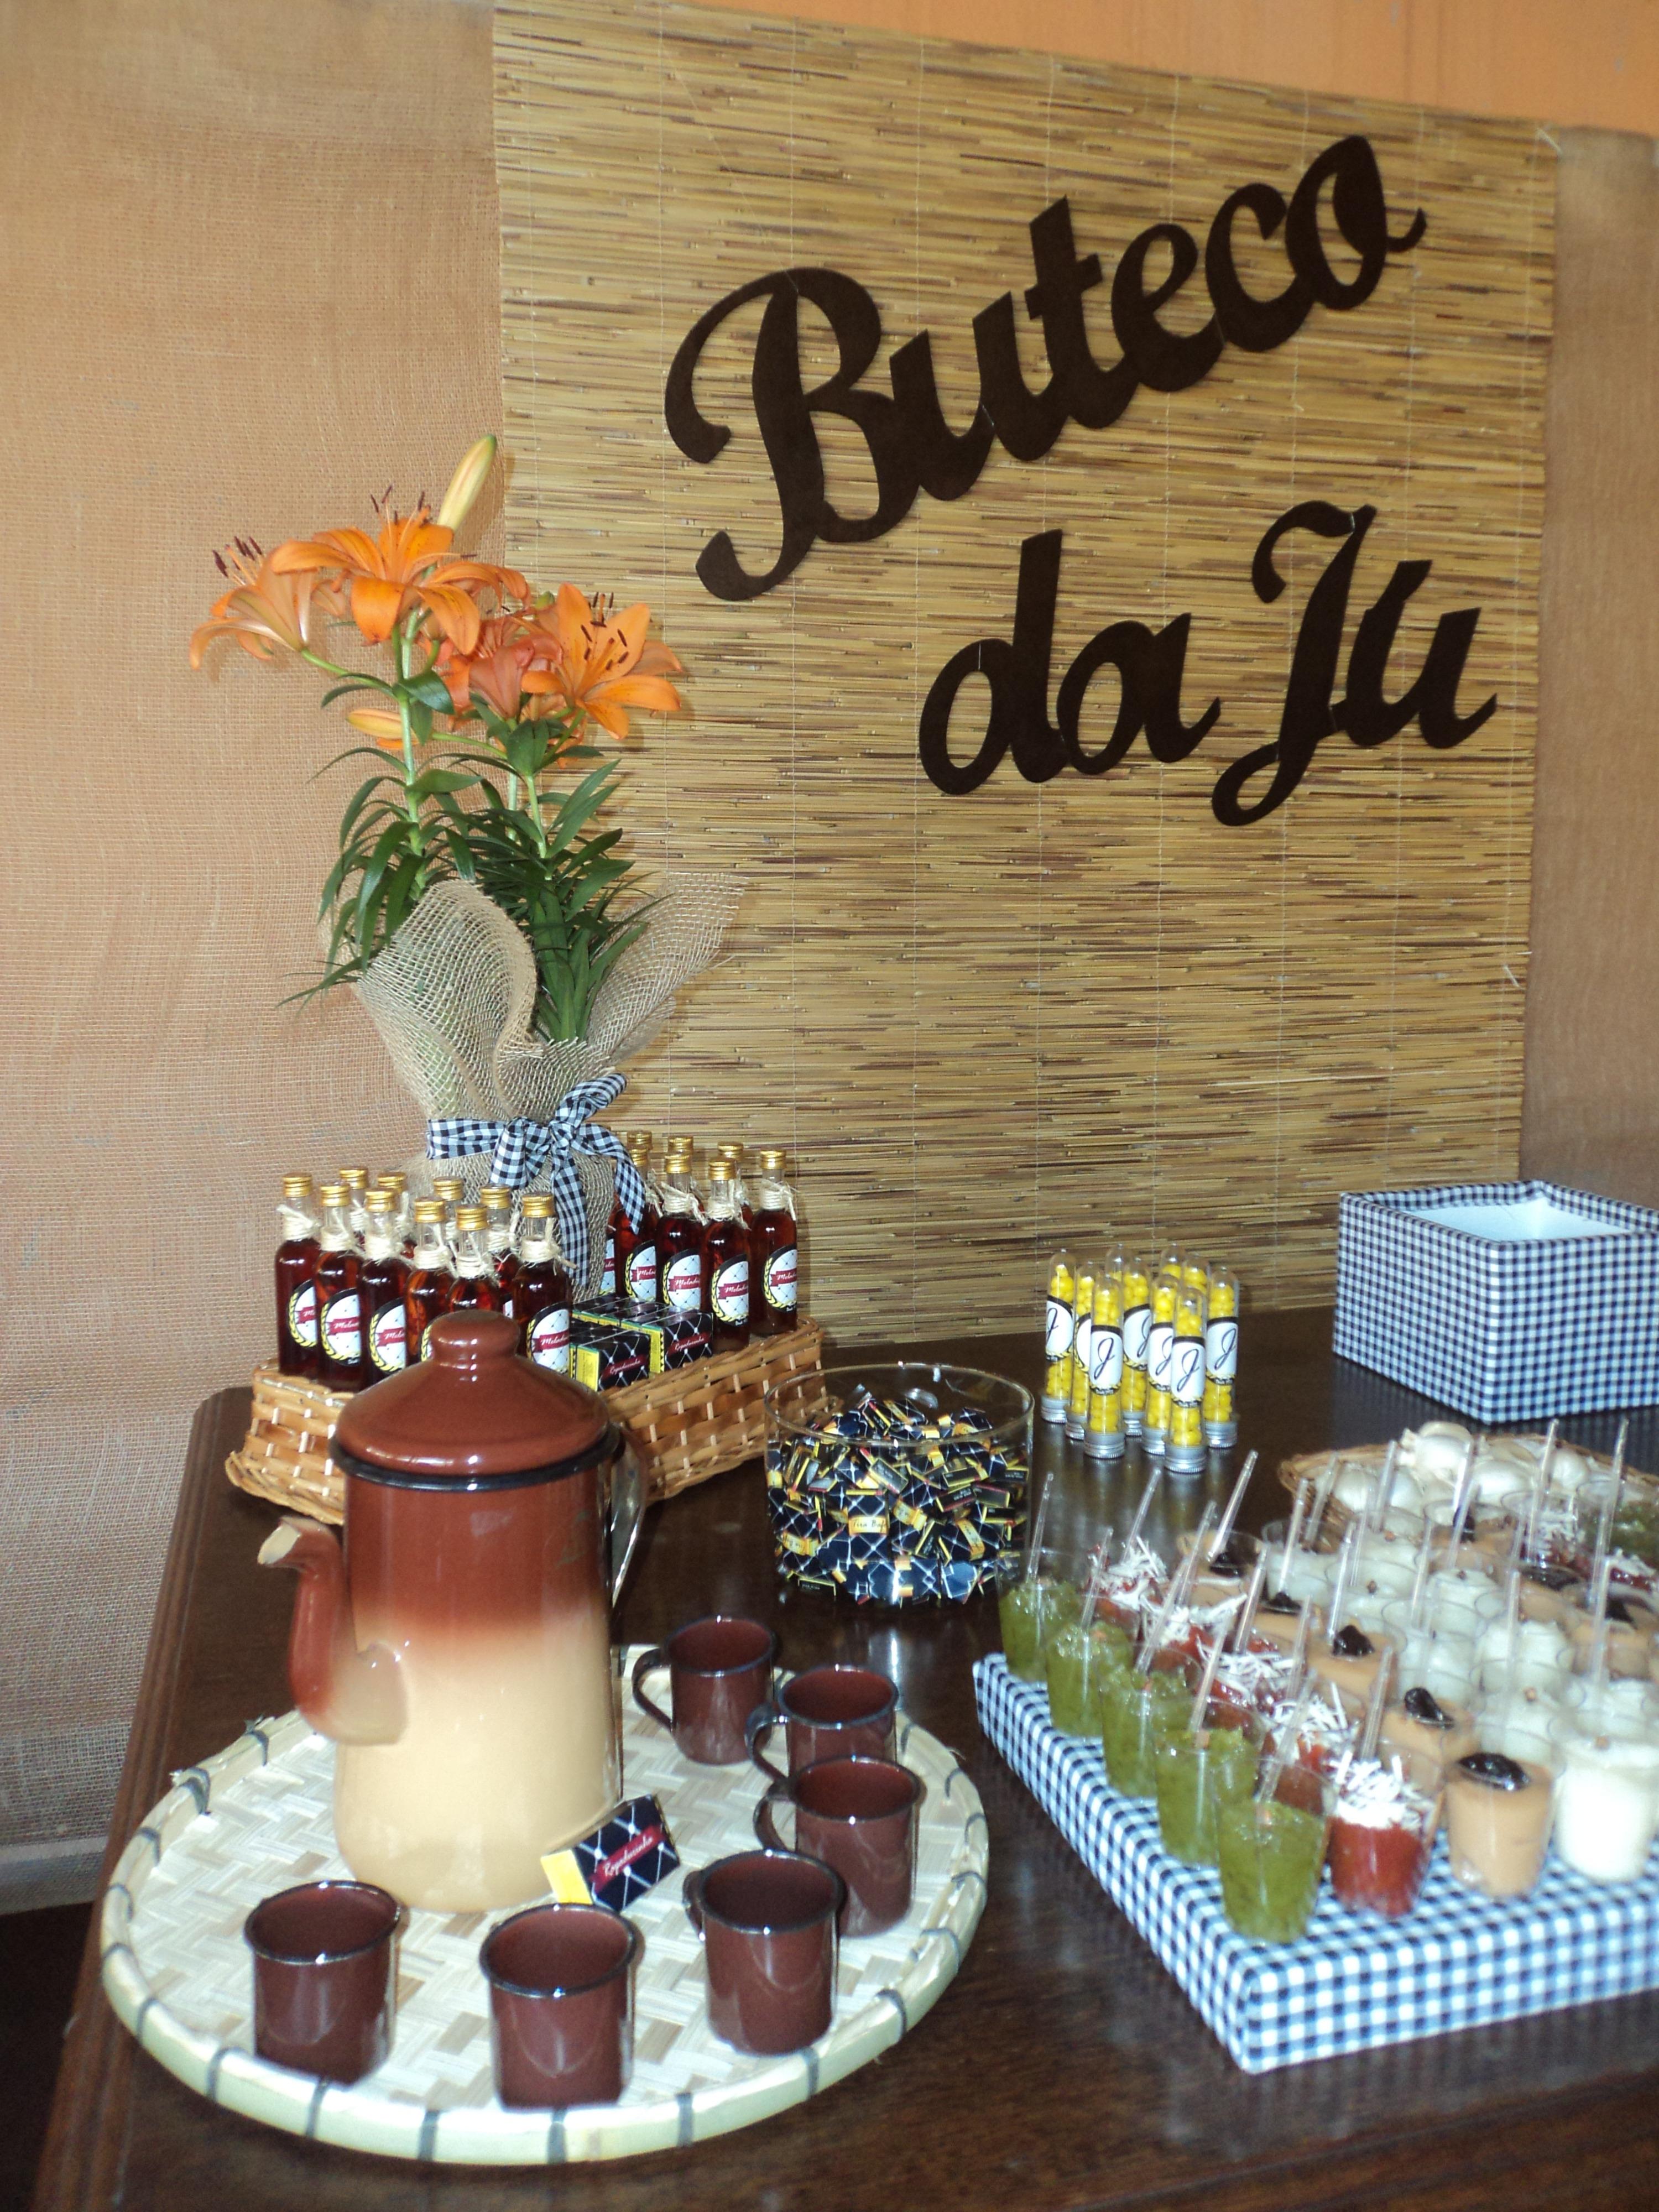 festa boteco decoracao rustica:decoracao-tema-comida-de-buteco-decoracao-tema-comida-de-buteco